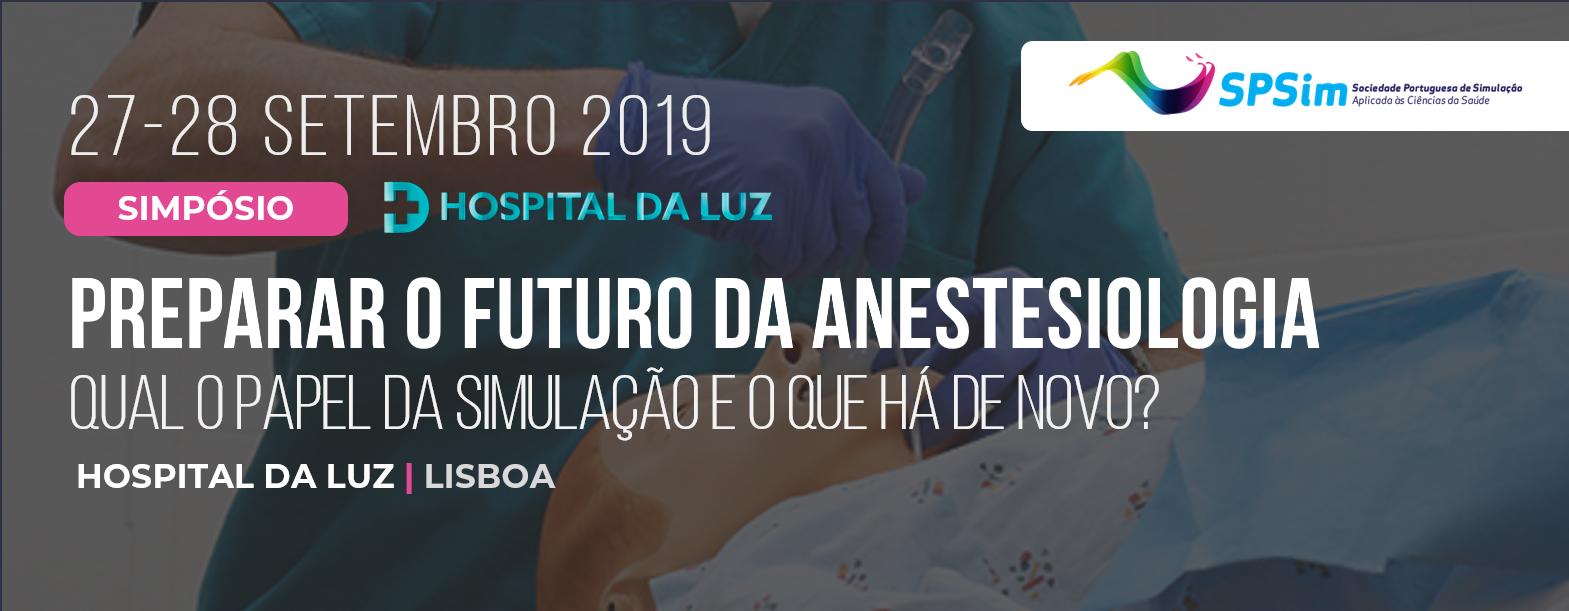 Hospital da Luz Lisboa